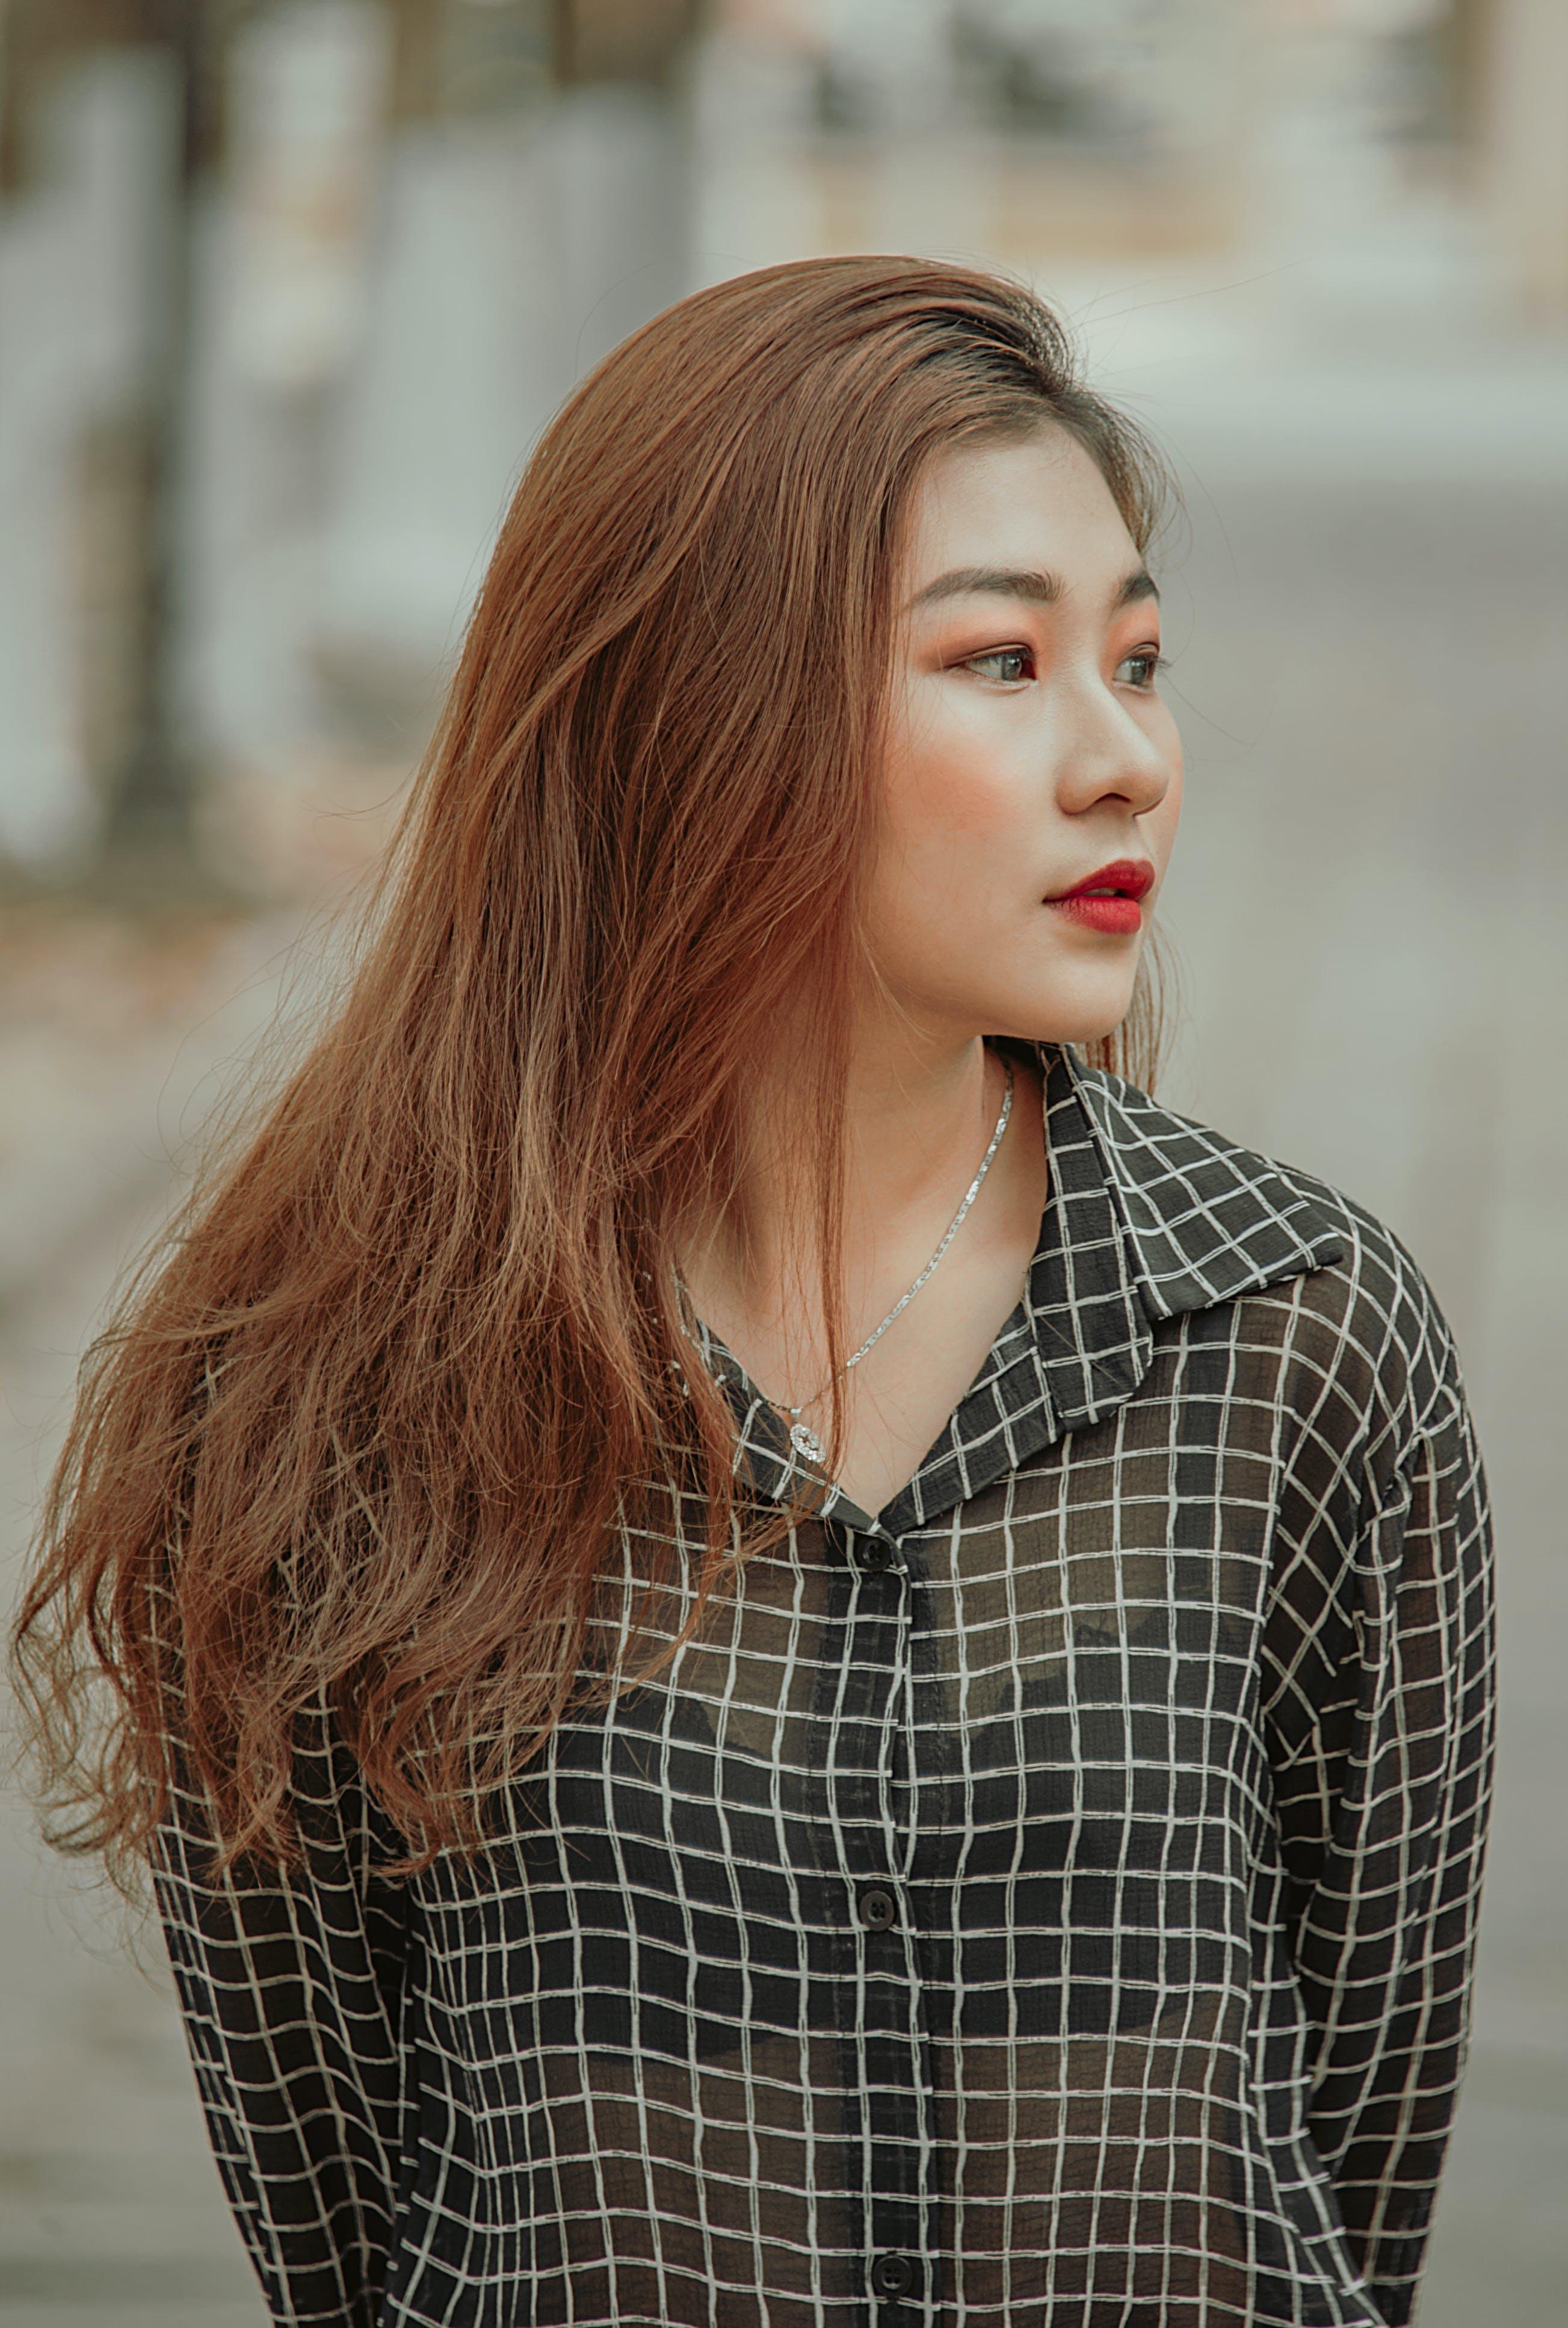 Woman Wearing Black and White Checkered Dress Shirt